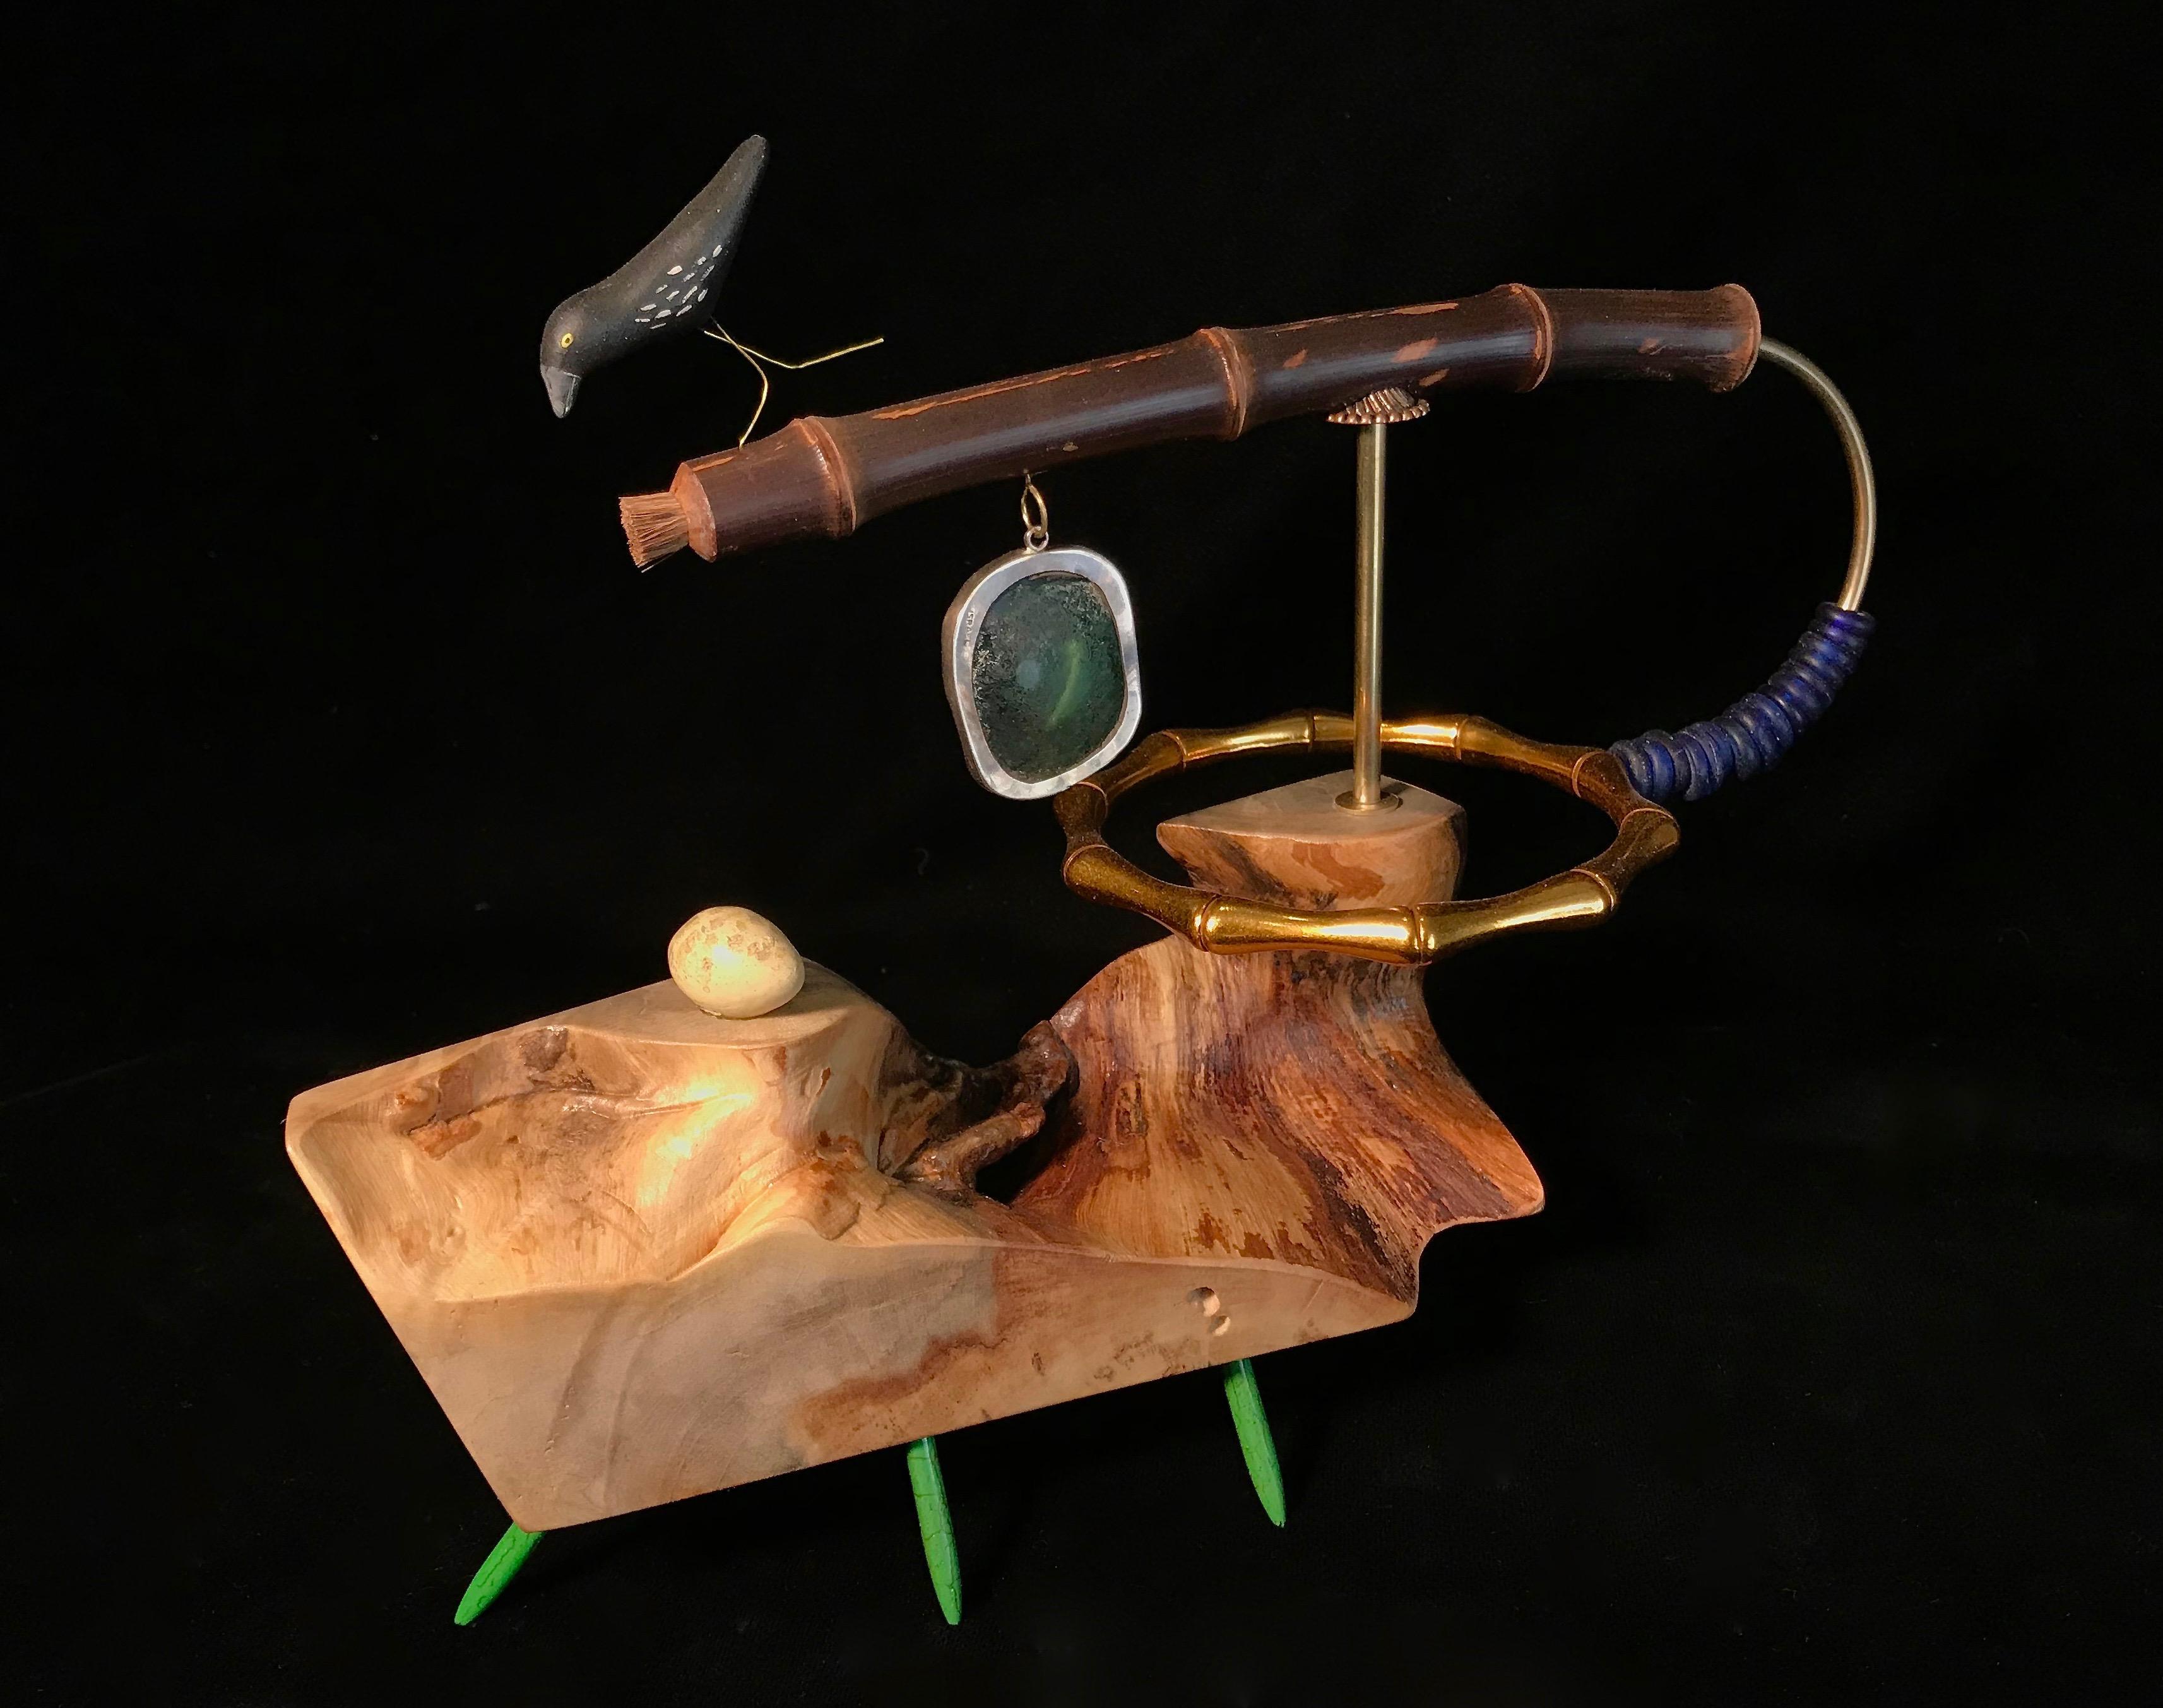 Roman Glass Balancer Whirligig